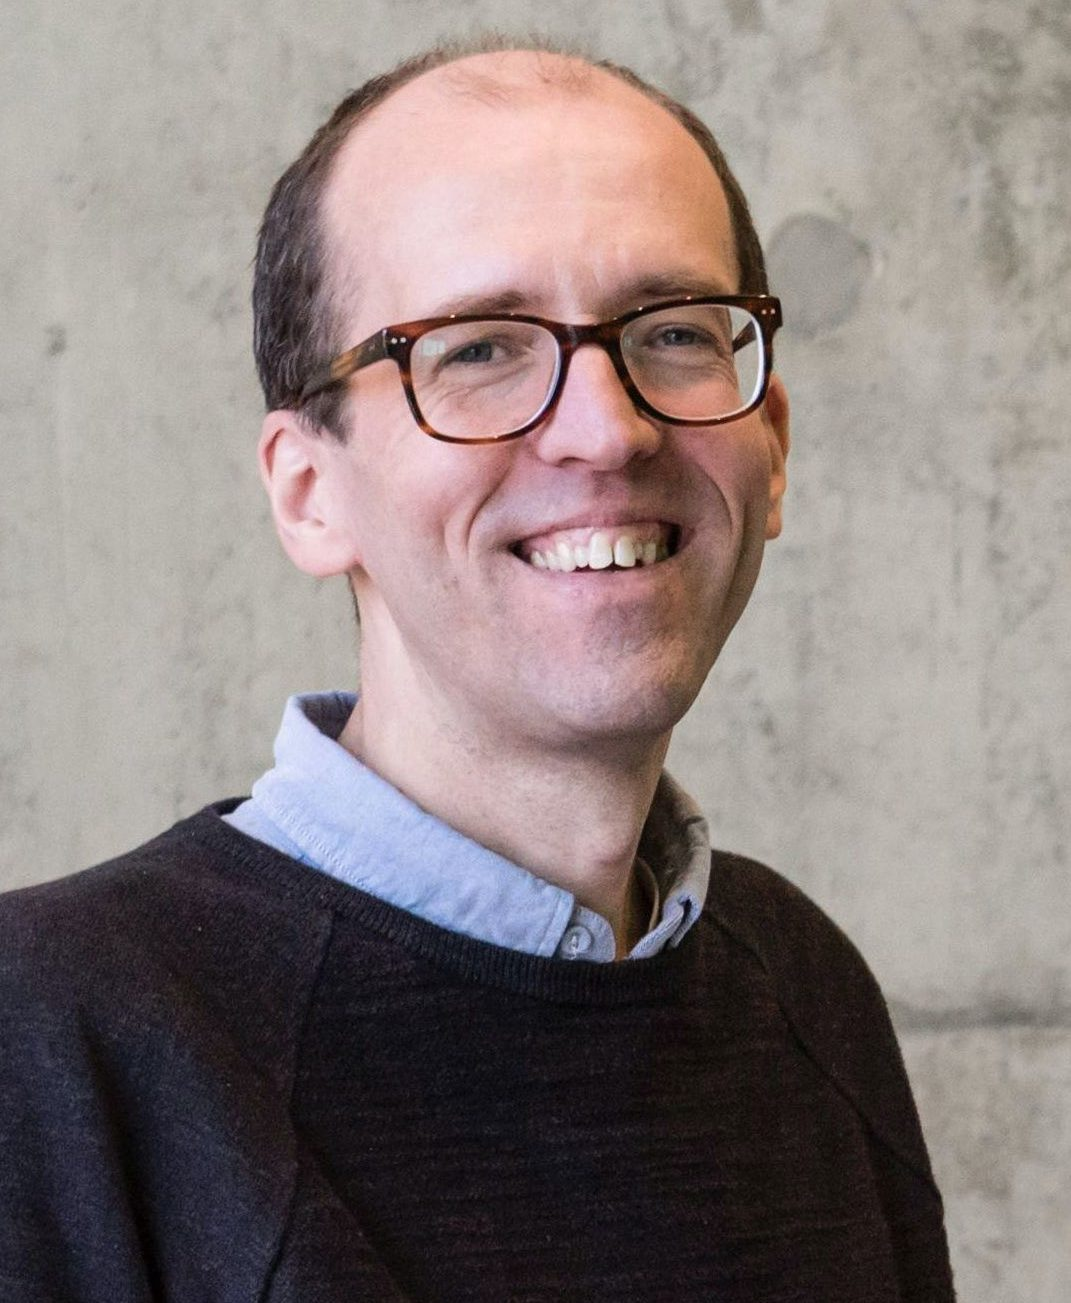 Prof. Sander Tans The Tans Lab, AMOLF